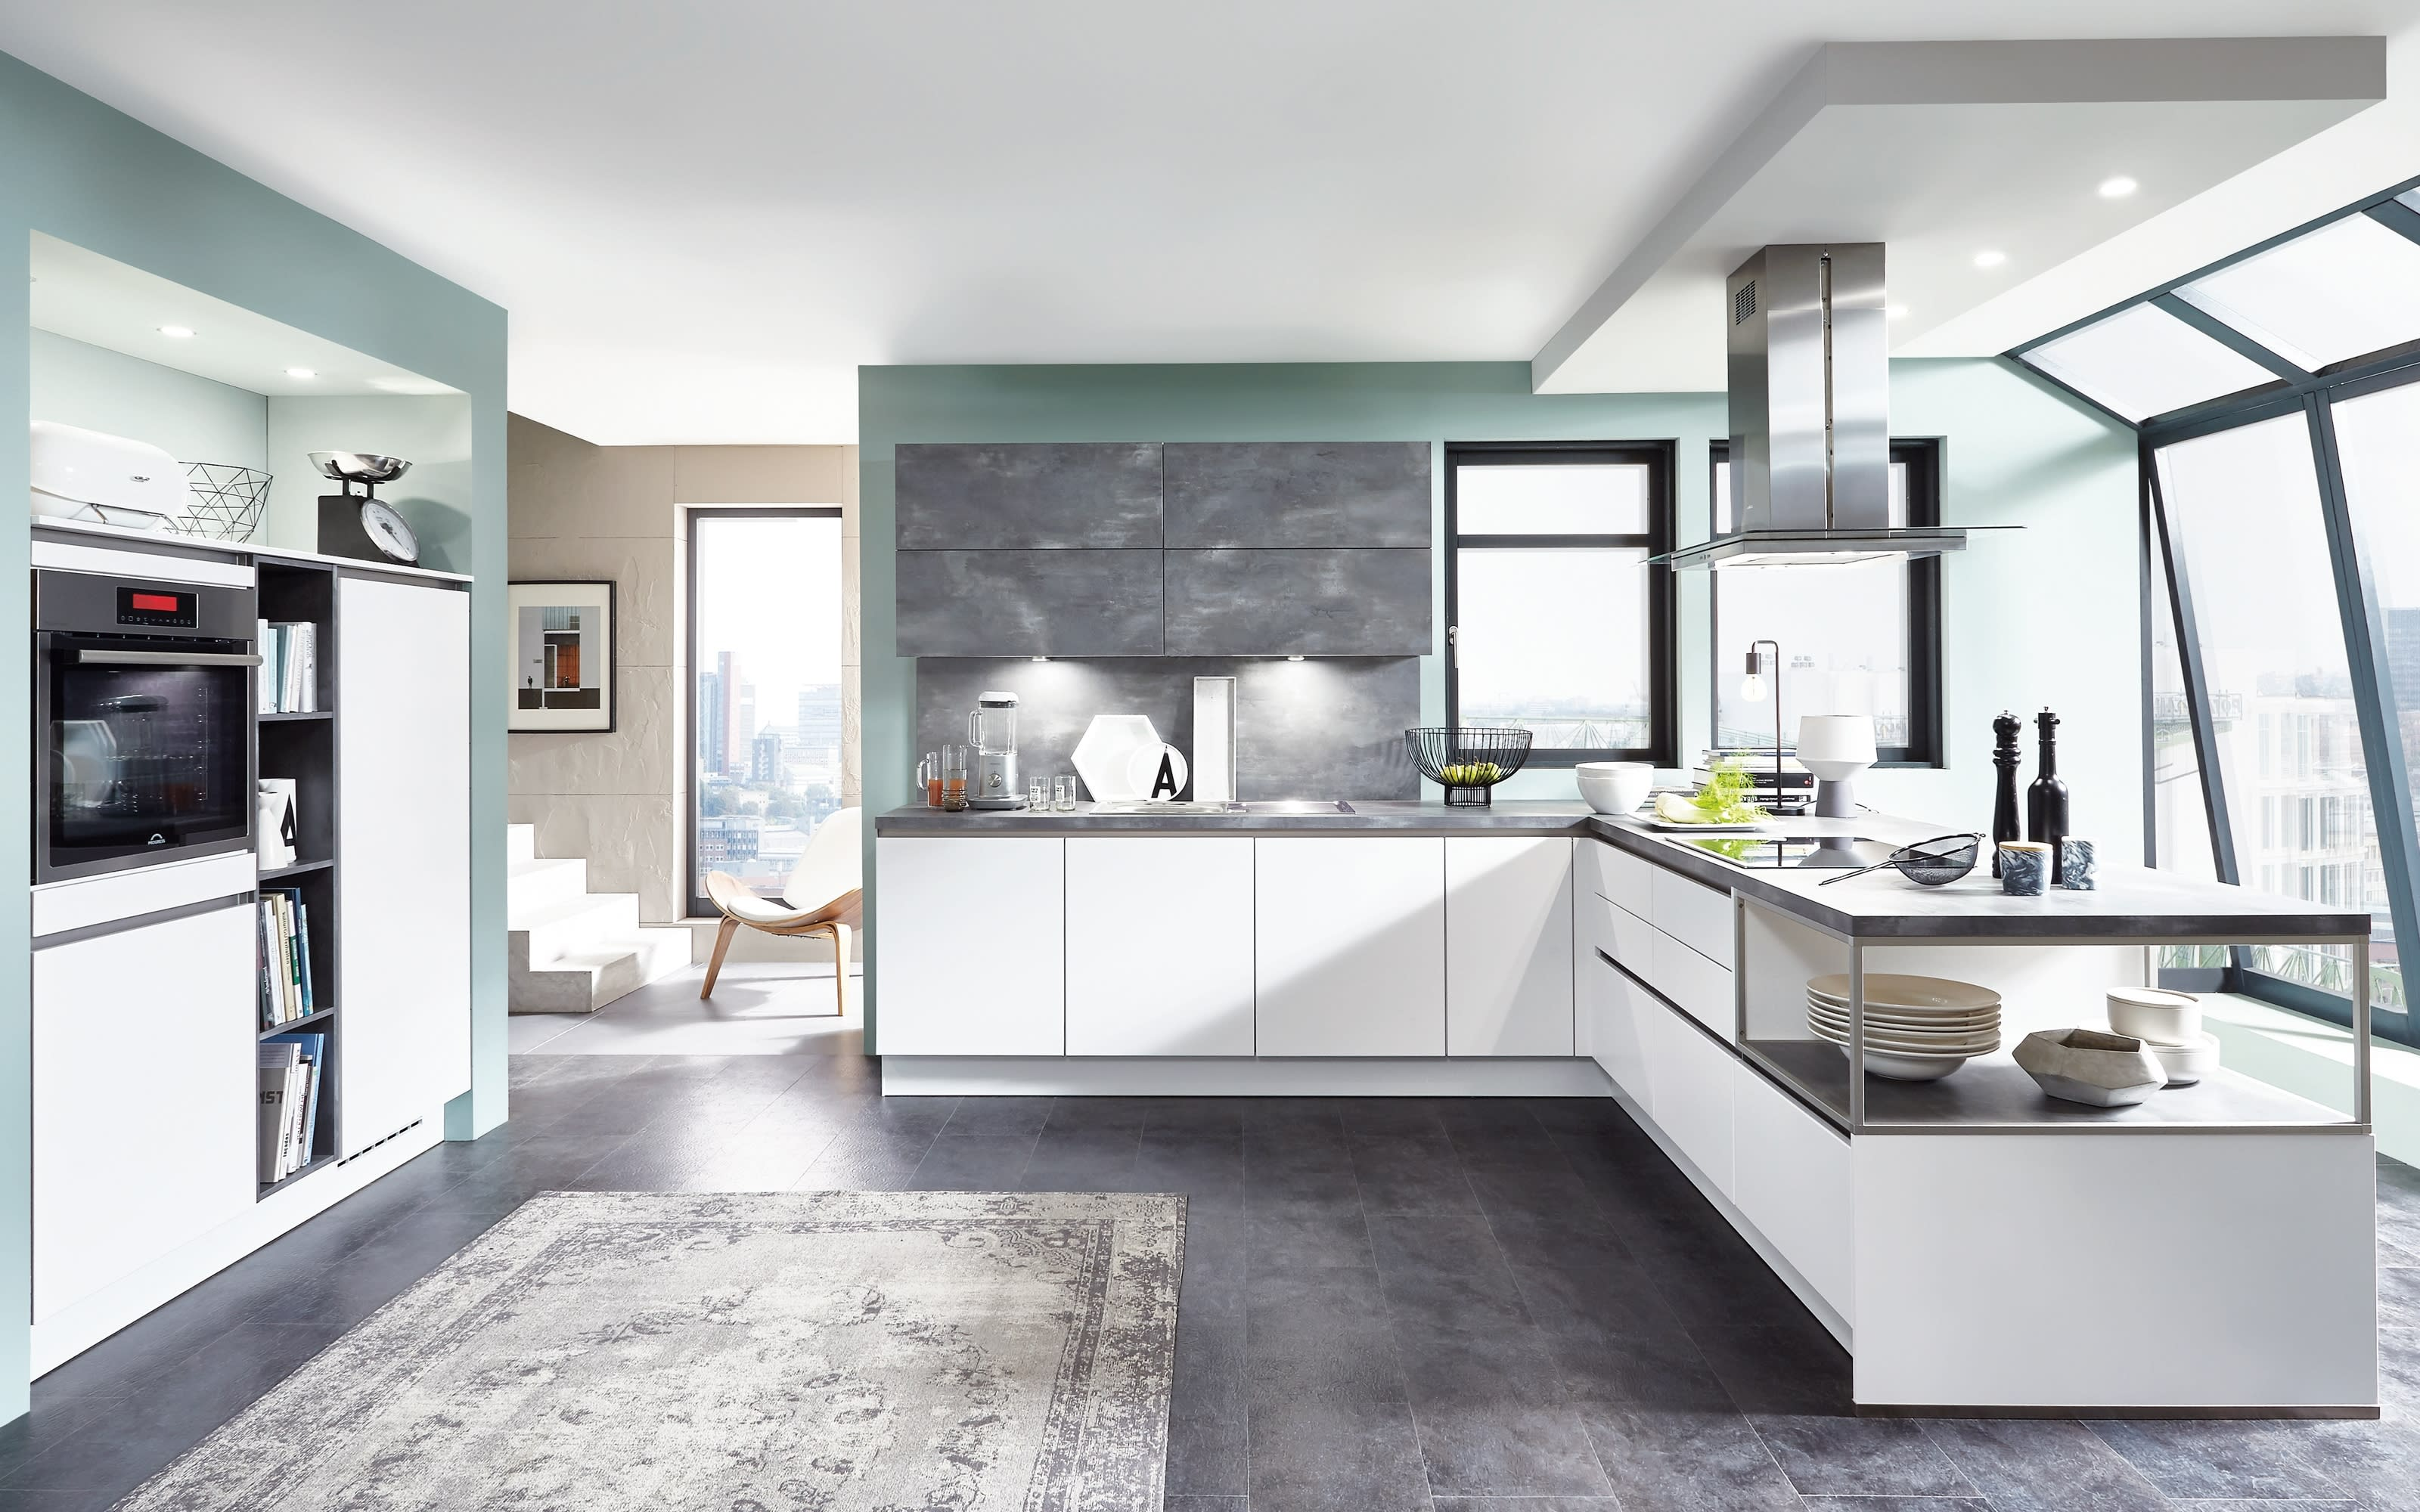 Einbauküche Fashion, alpinweiß, inklusive Elektrogeräte, inklusive AEG Geschirrspüler